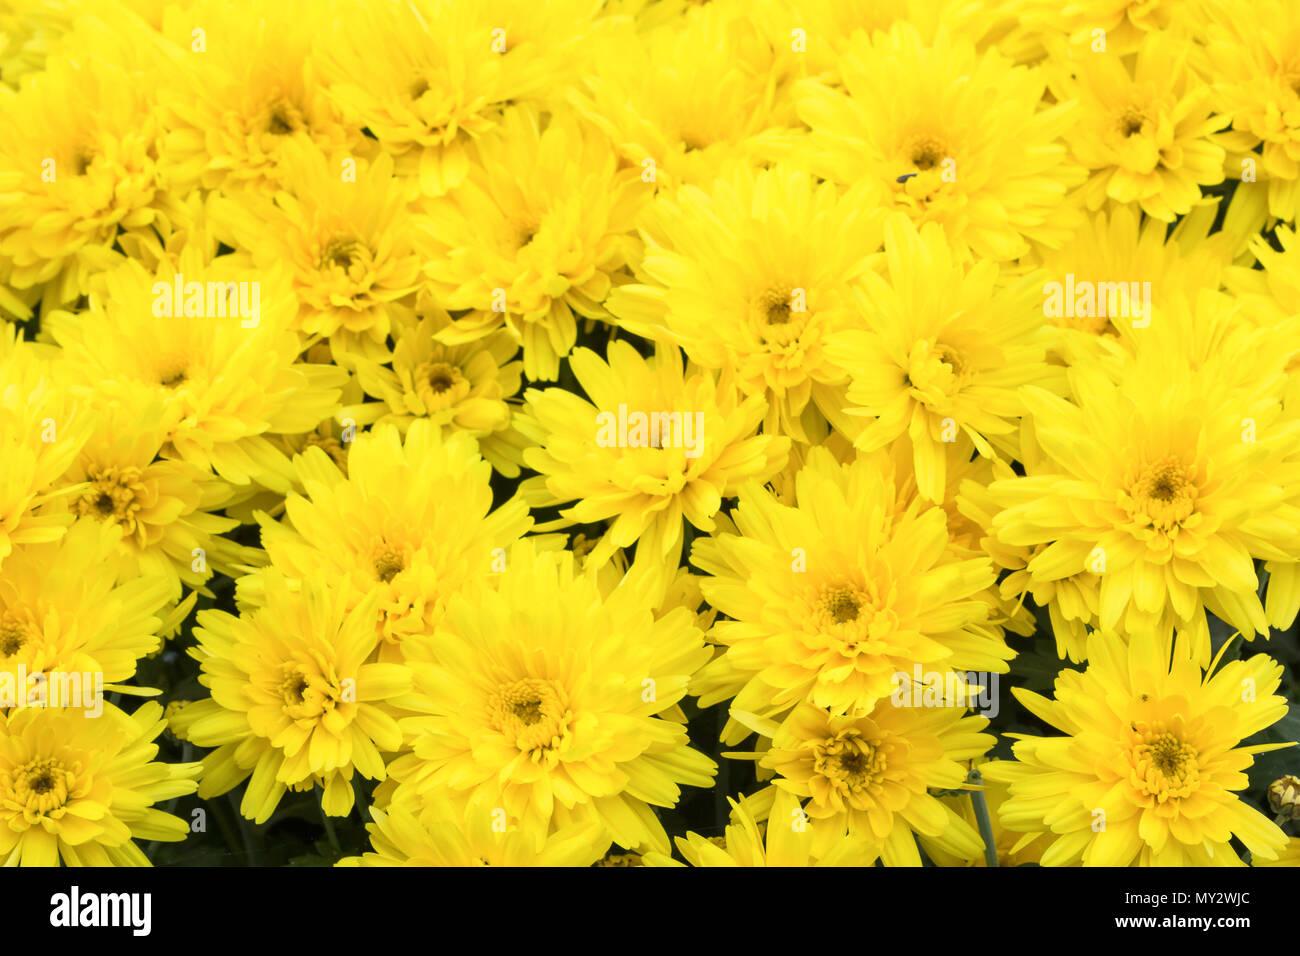 Yellow Chrysanthemums Daisy Flower Background Yellow Bloom Flowers